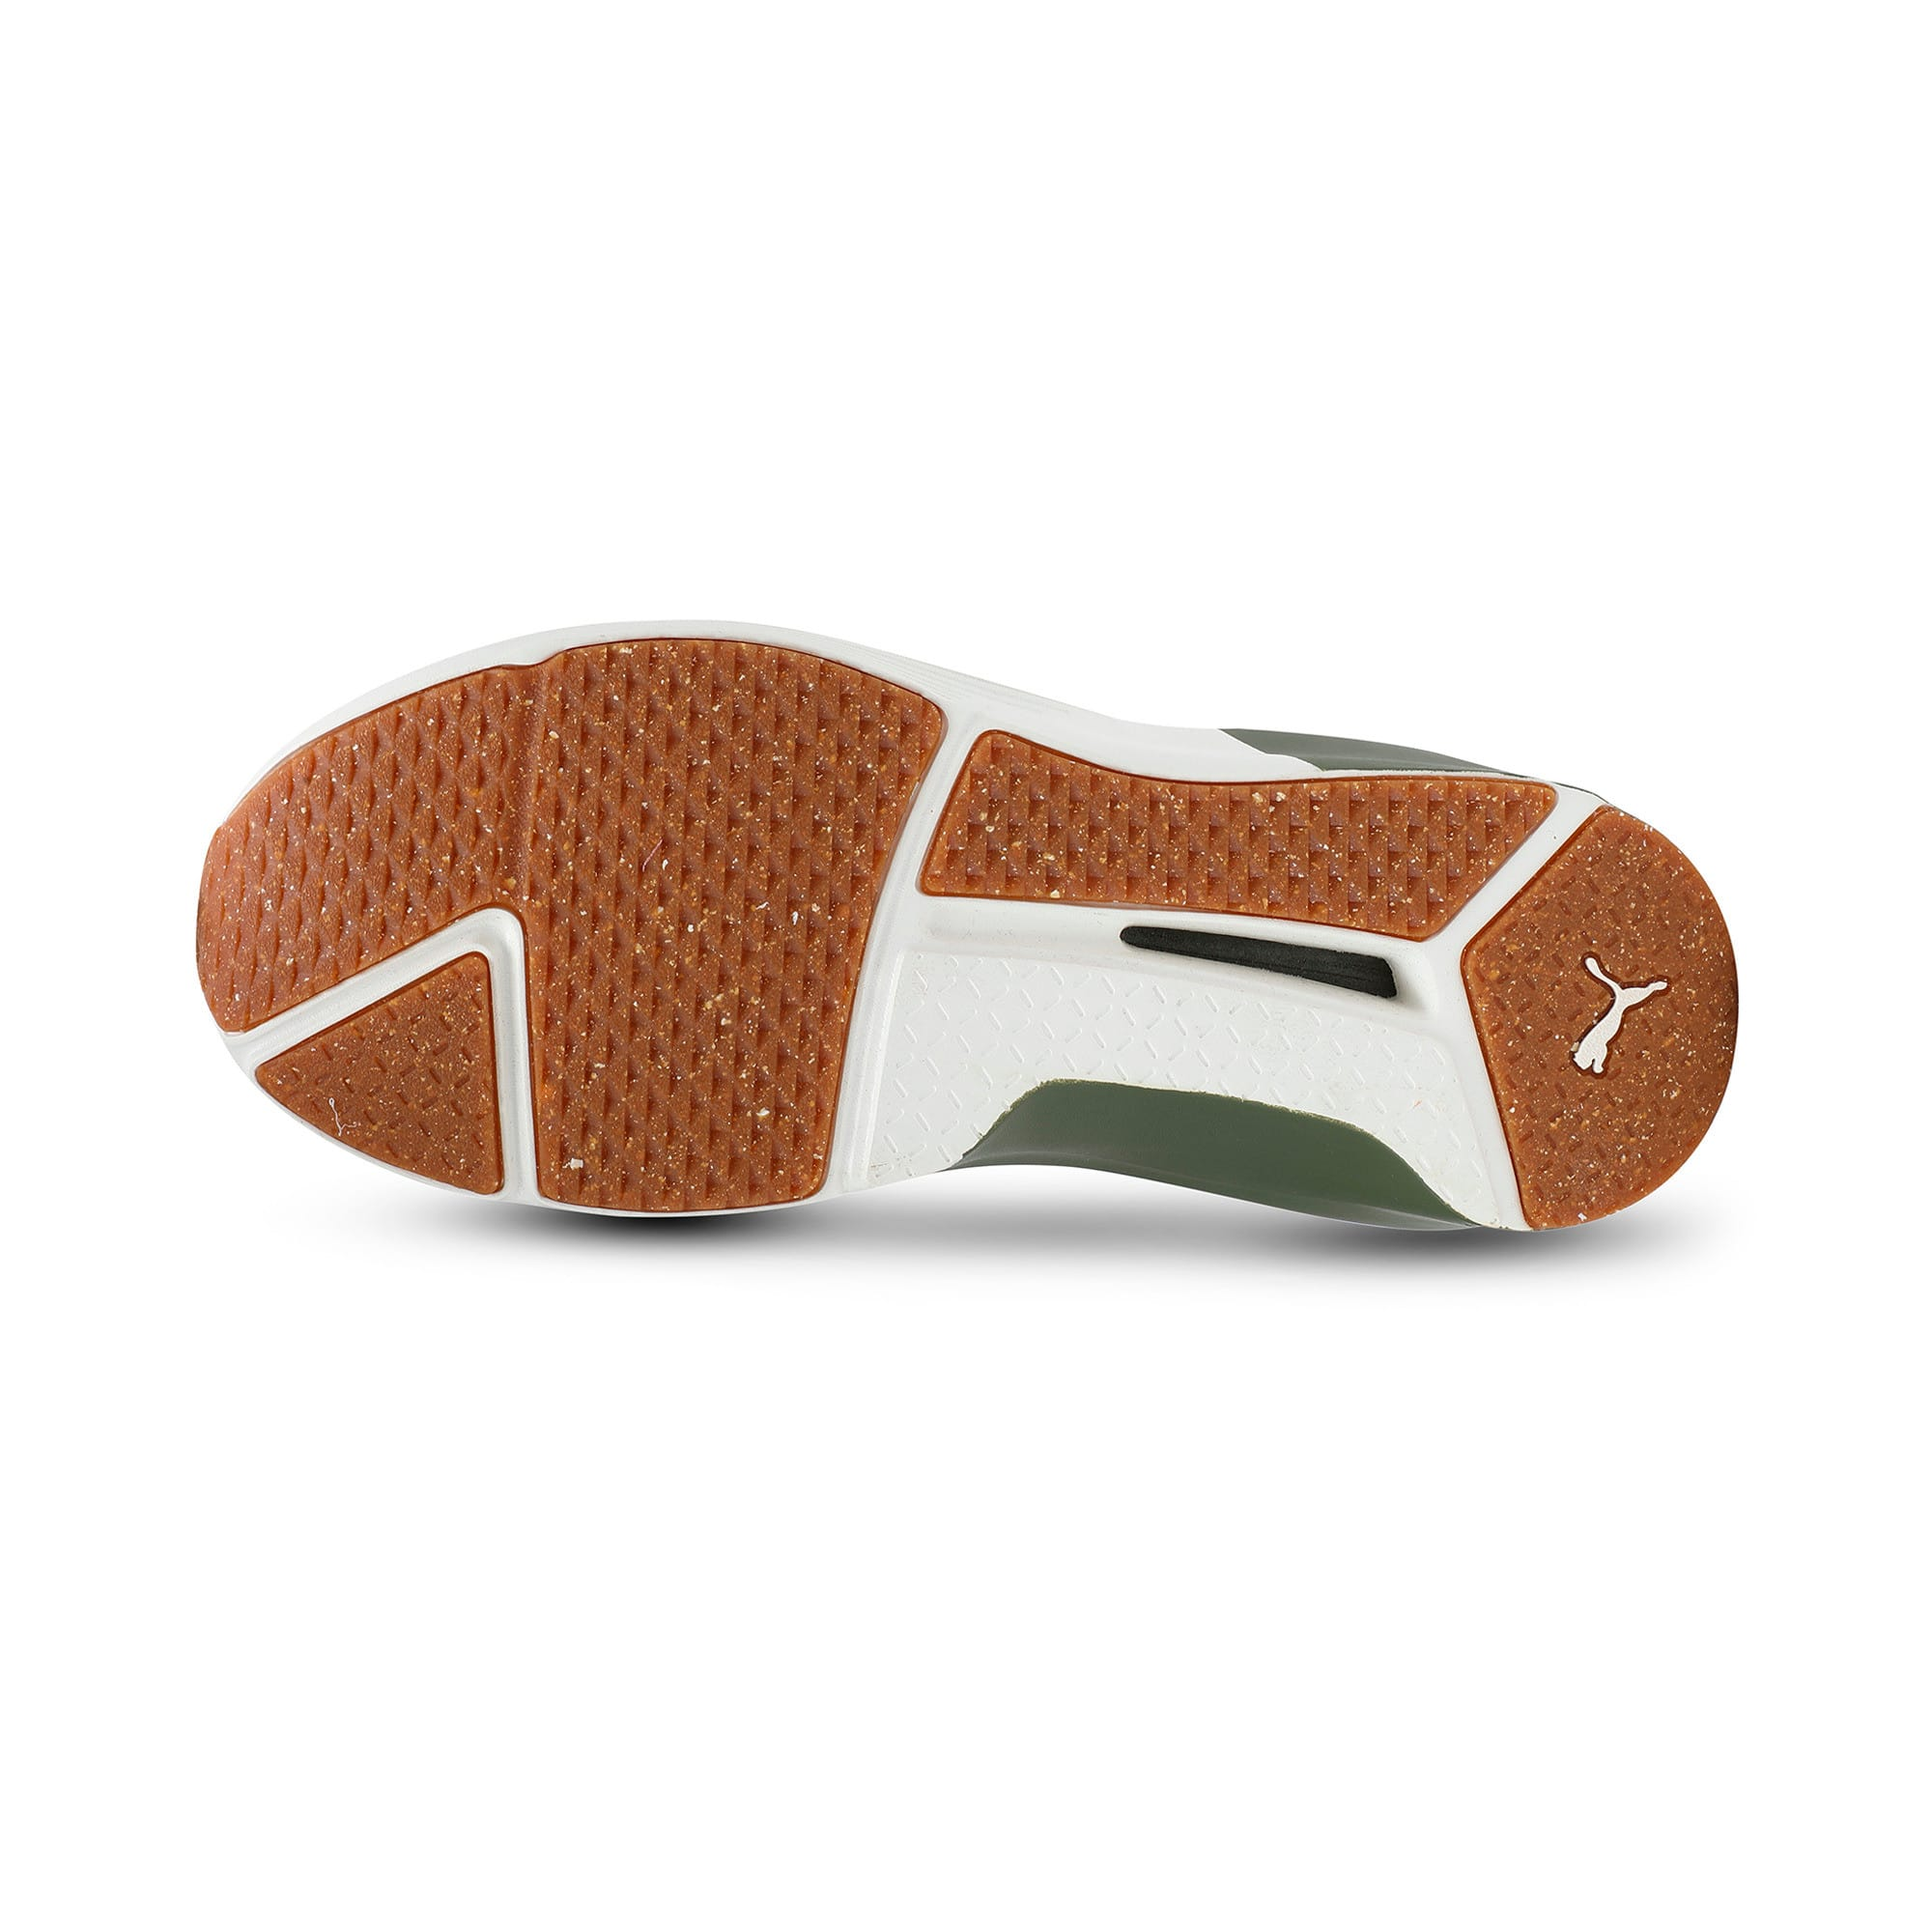 Thumbnail 4 of Fierce Rope VR Women's Training Shoes, Olive Night-Whisper White, medium-IND